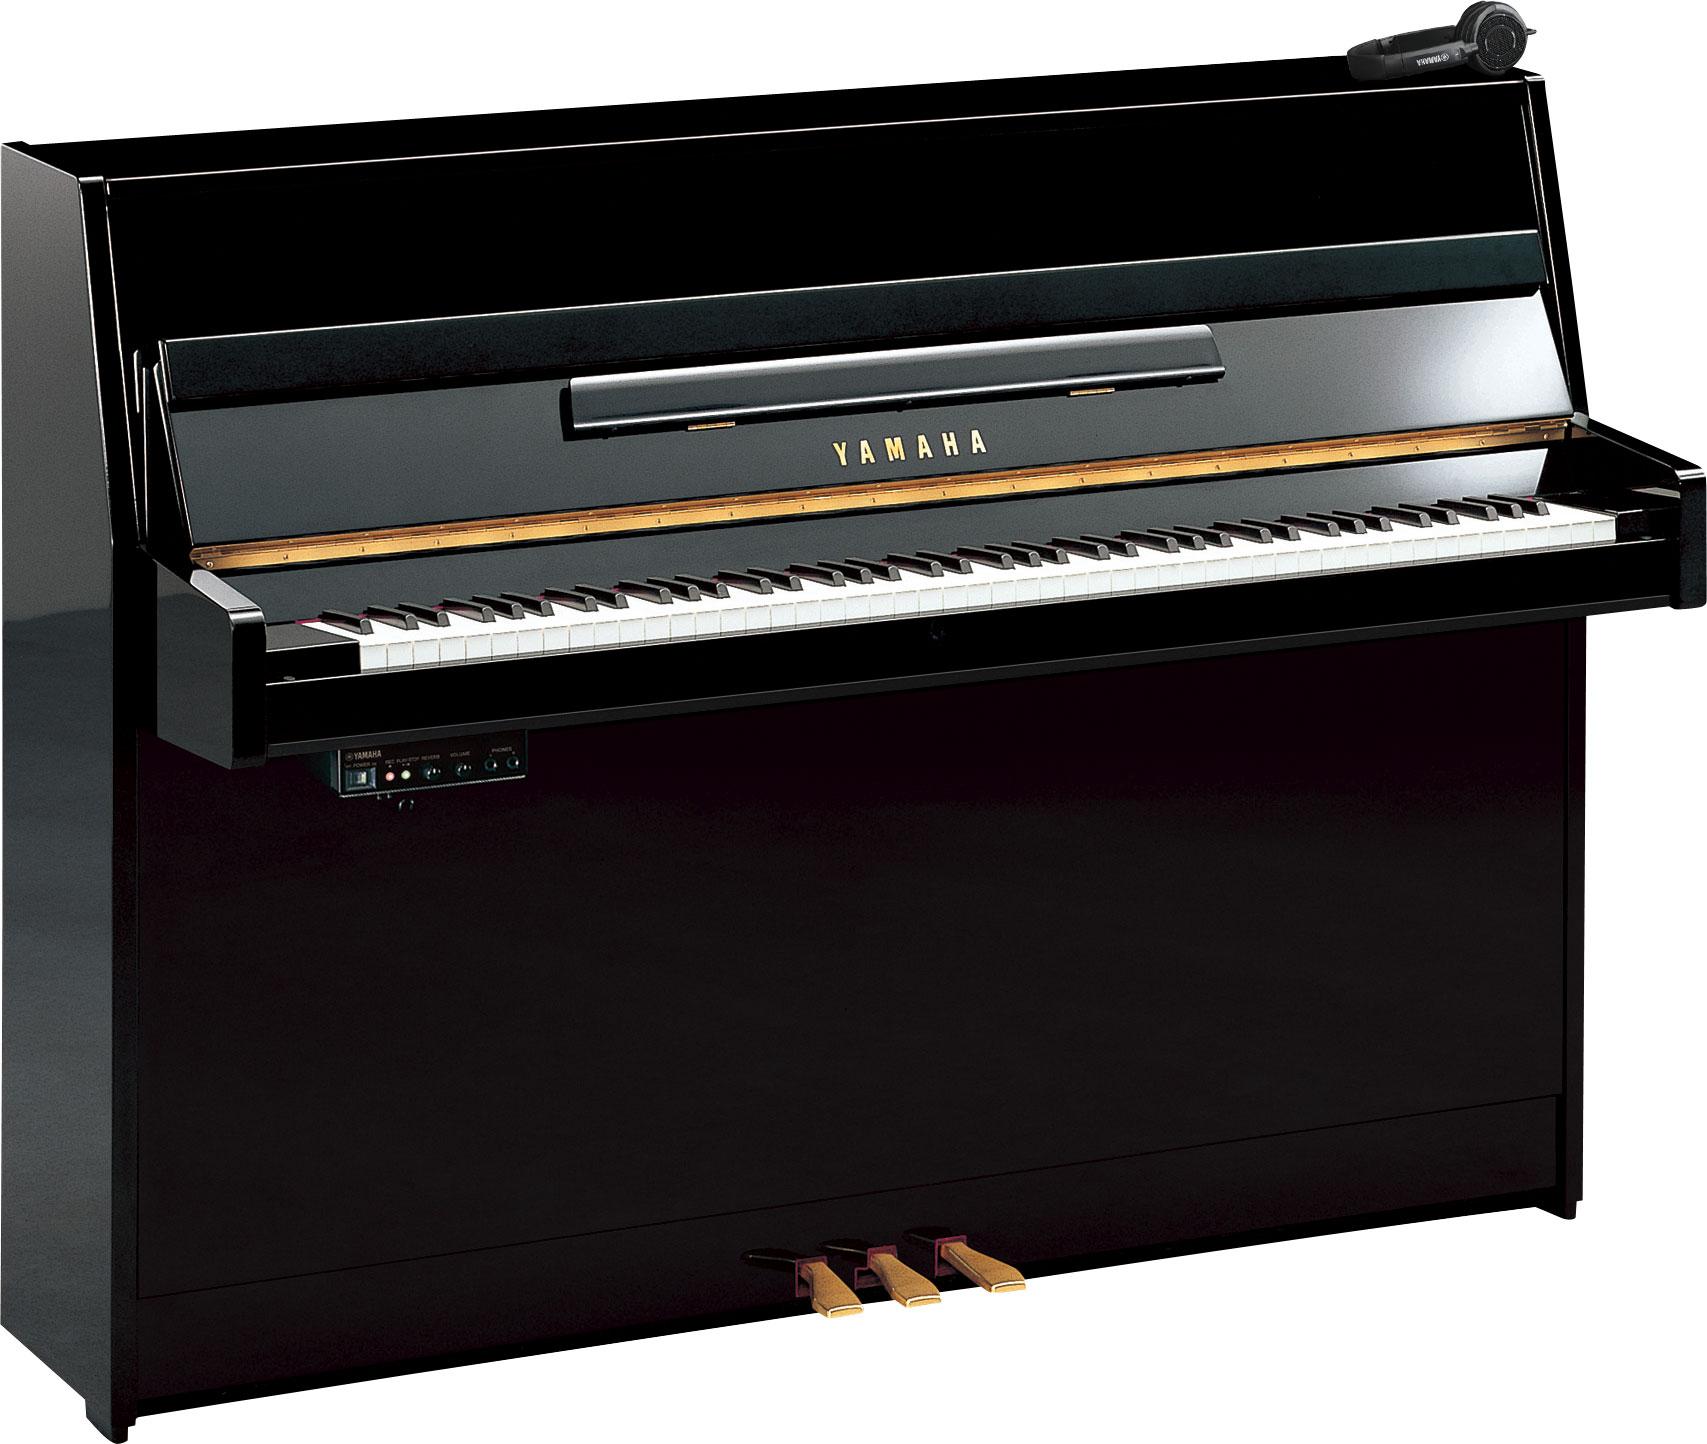 Yamaha B Silent Piano Price